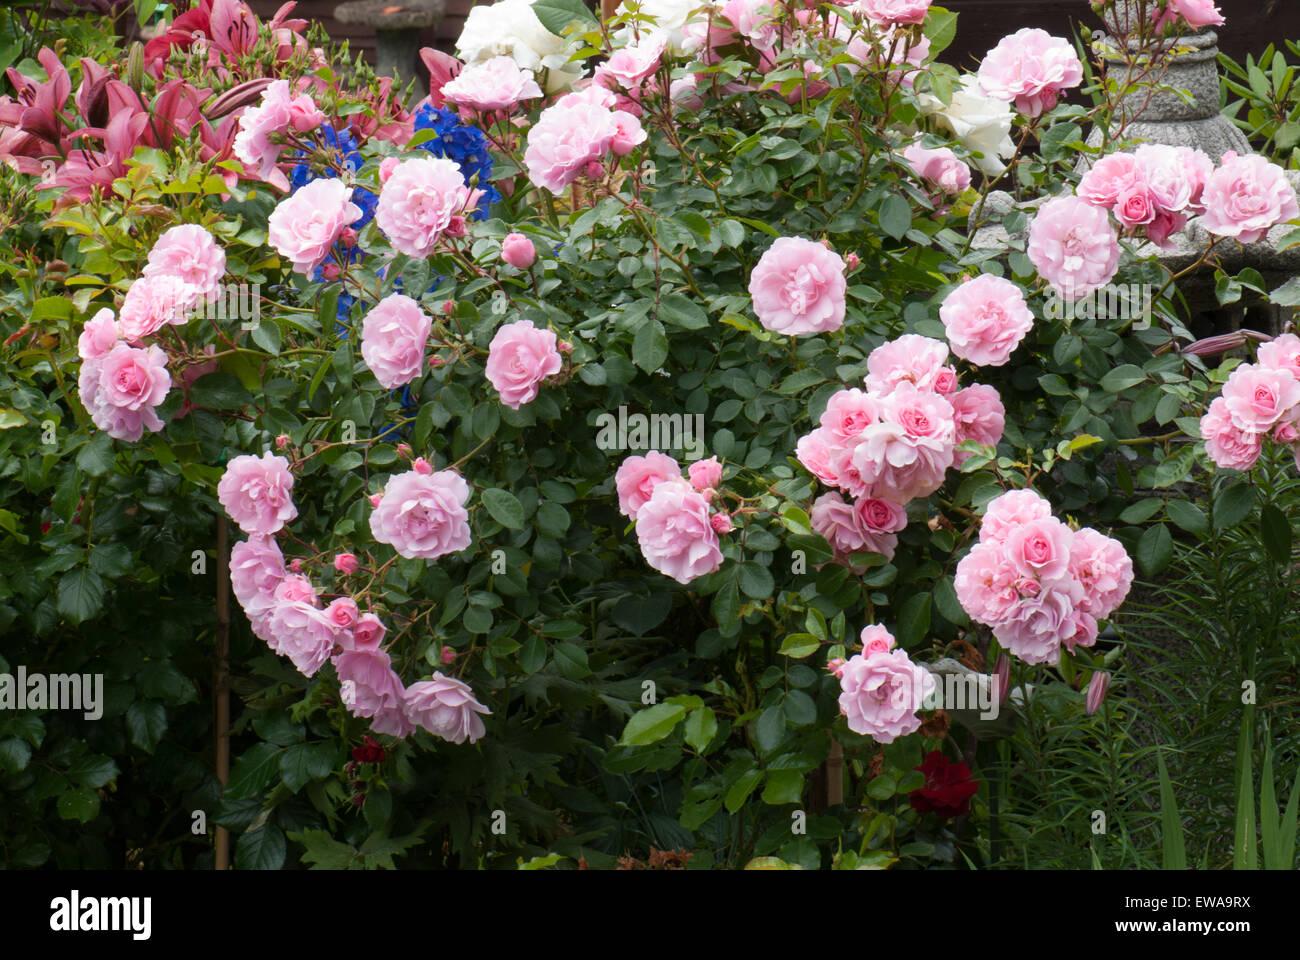 Flower carpet pink standard rose stock photo 84435118 alamy flower carpet pink standard rose mightylinksfo